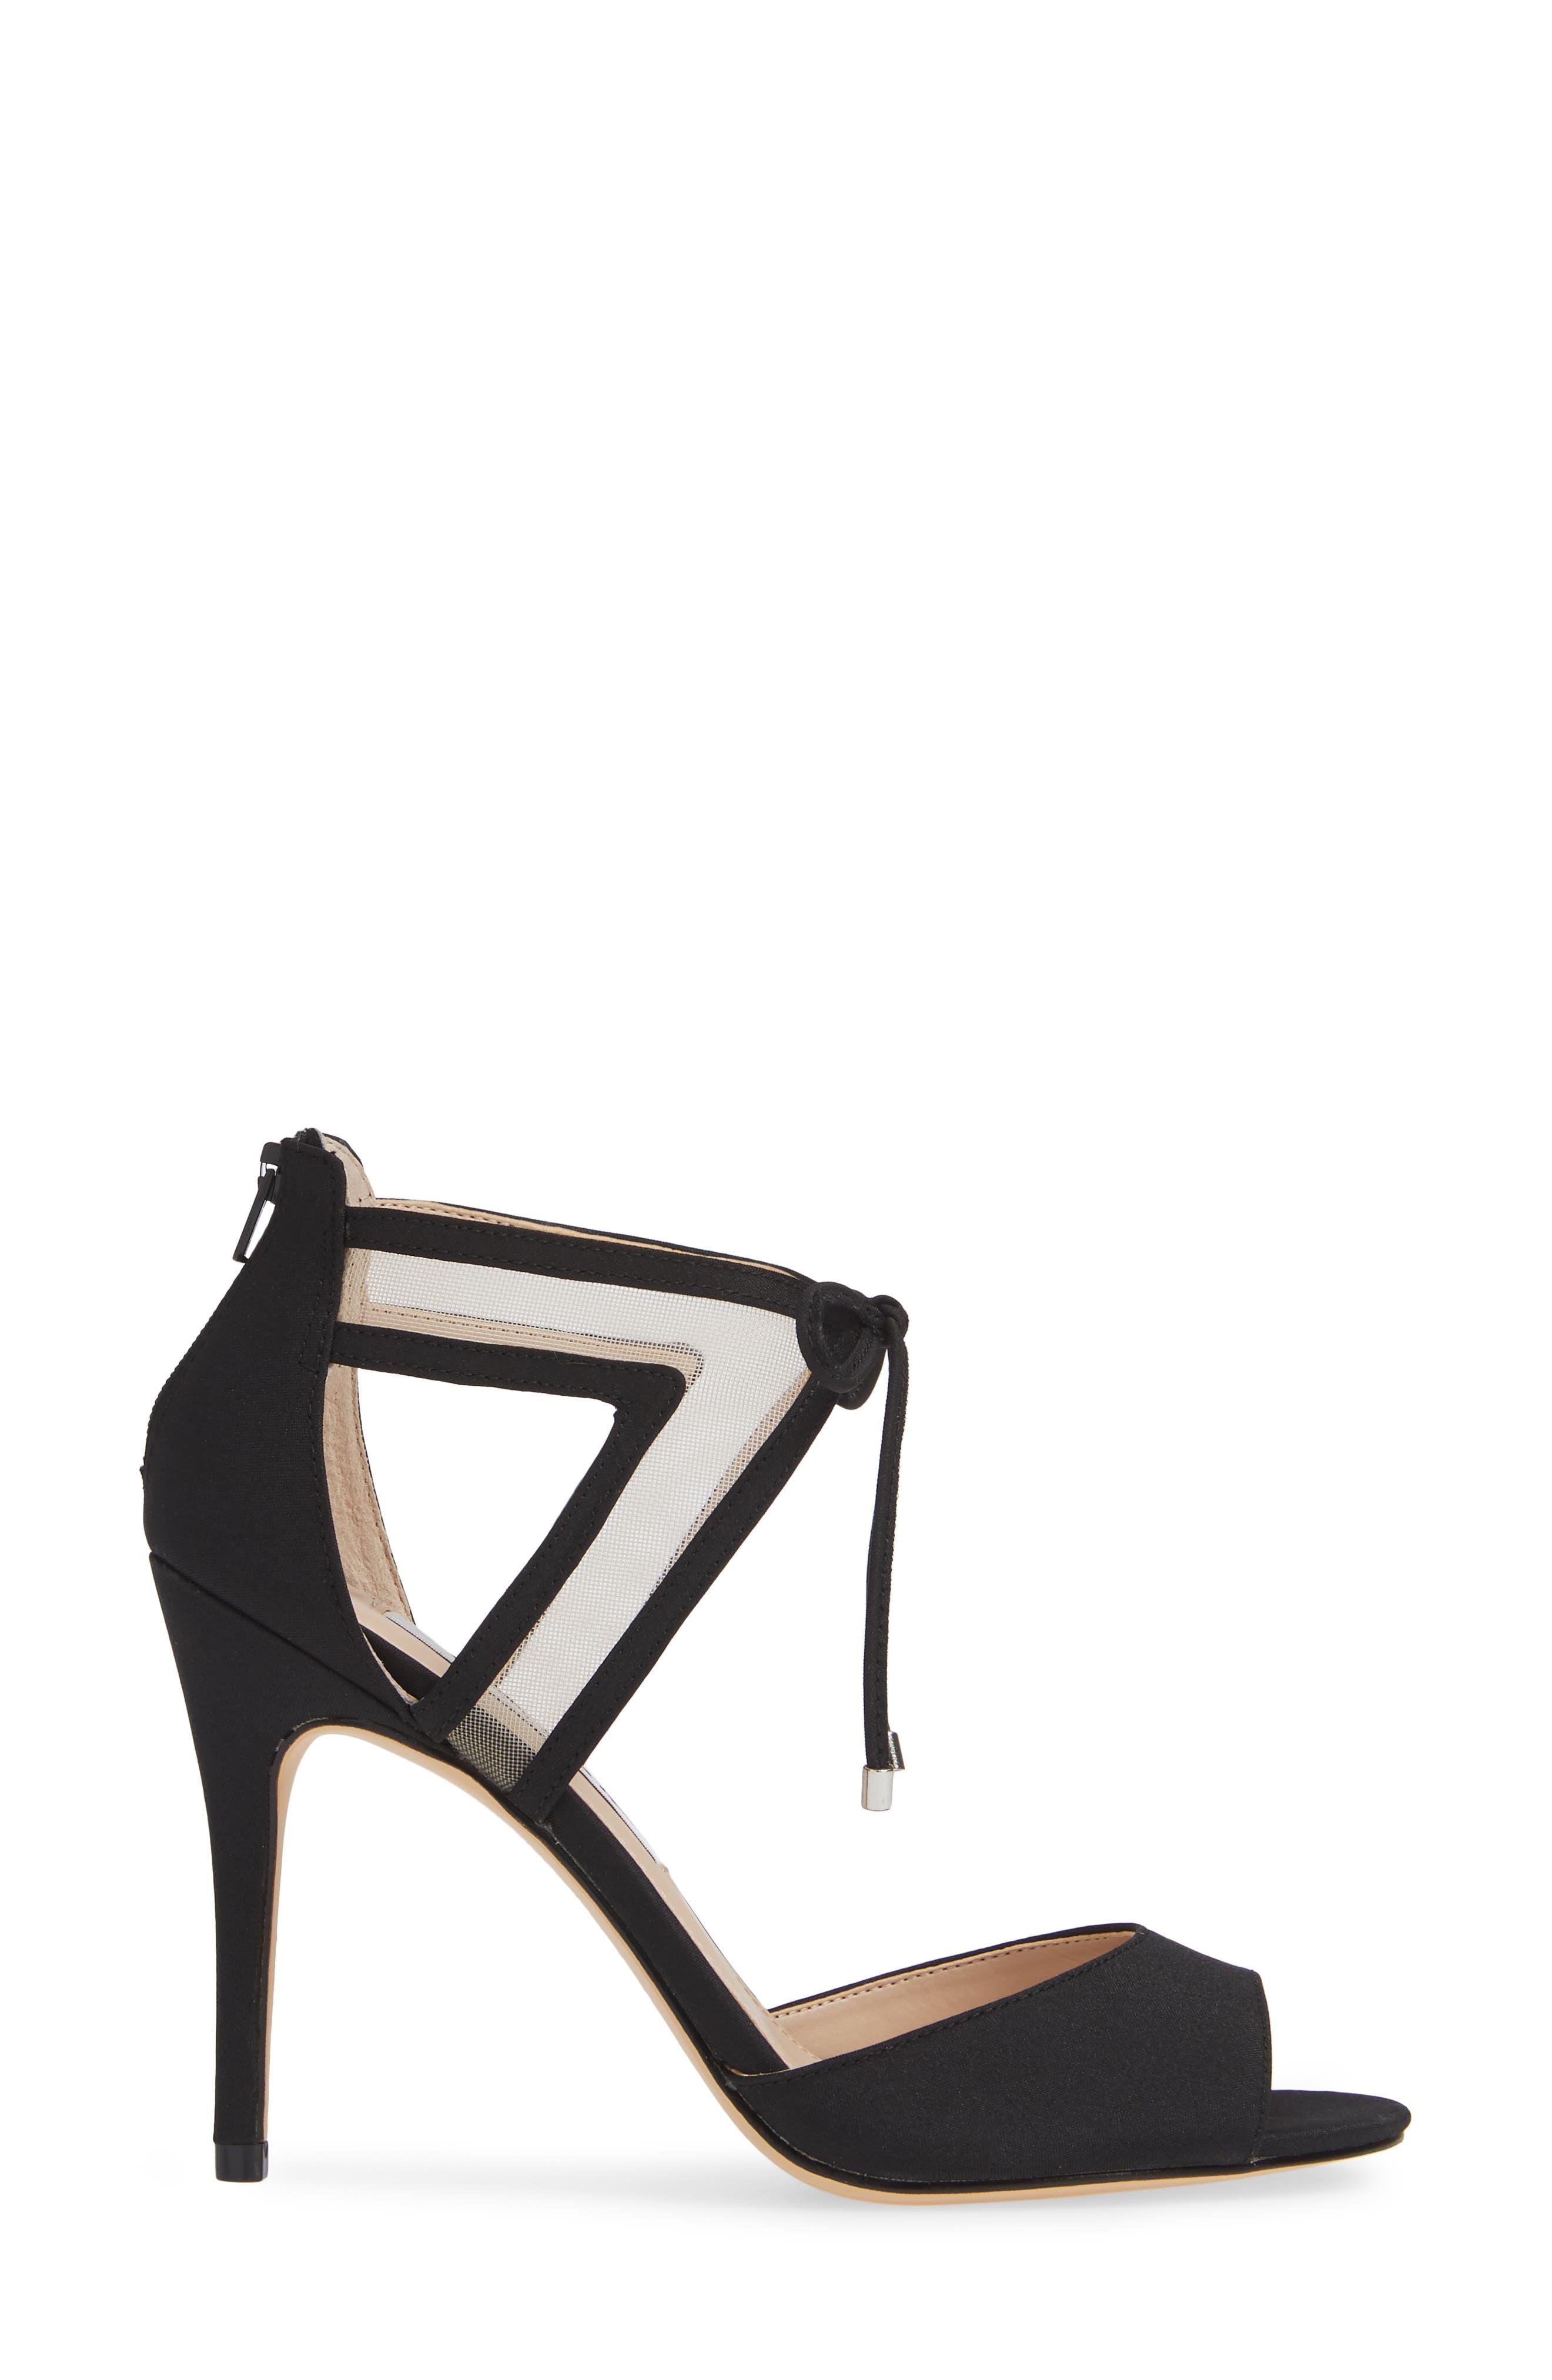 Caleya Ankle Tie Sandal,                             Alternate thumbnail 3, color,                             BLACK CHAMPAGNE